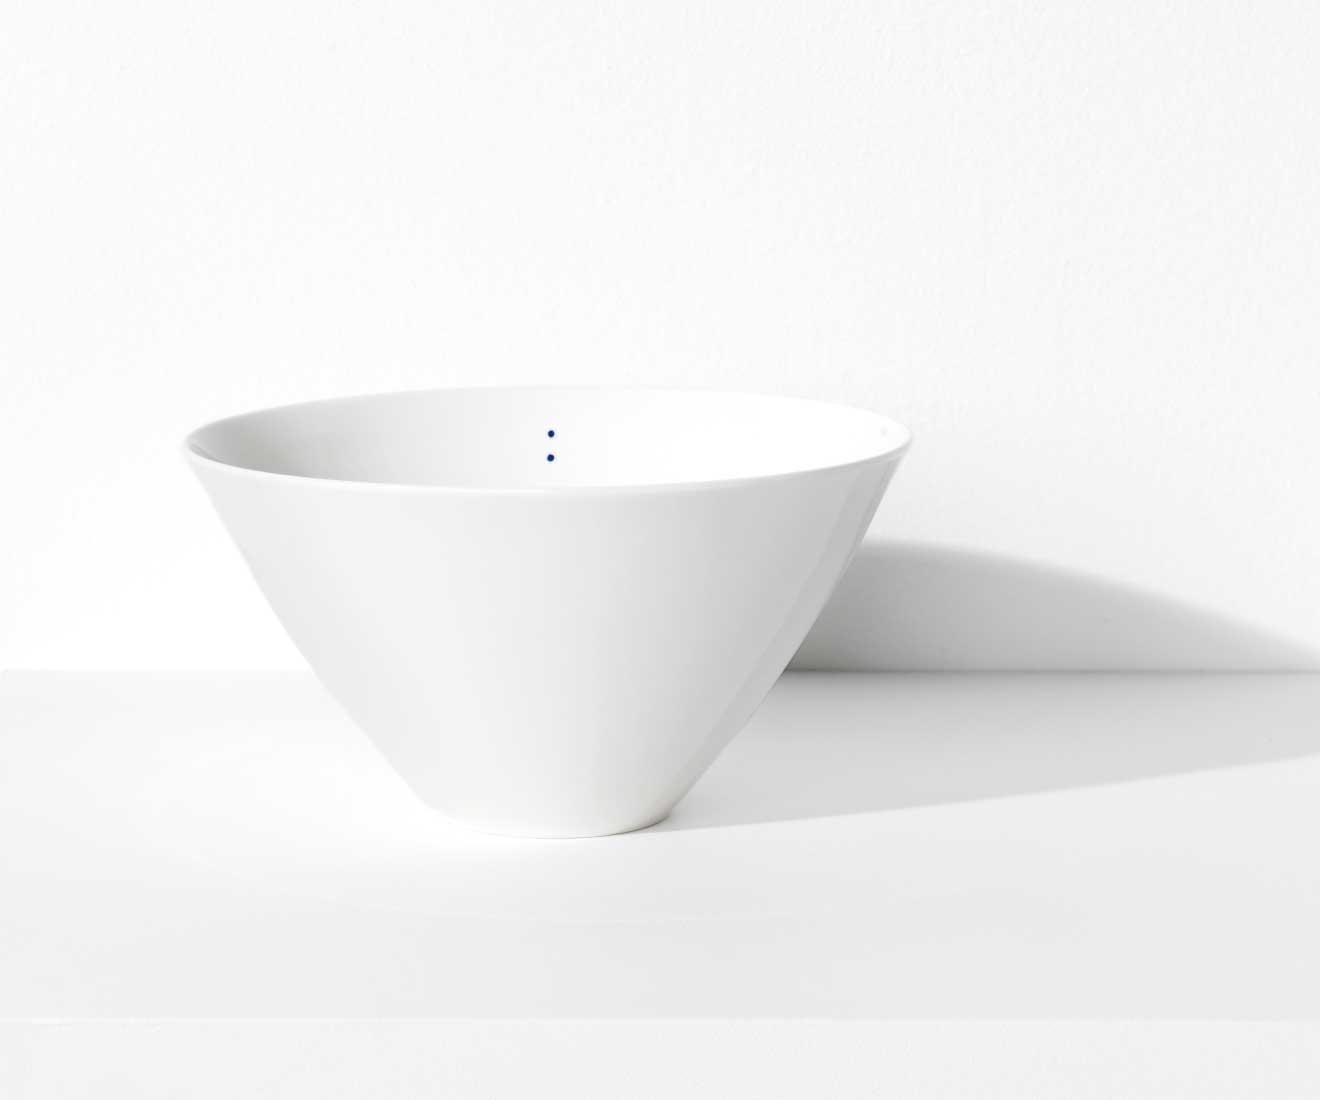 Motarasu Products - Shiro bowl Large with 2 dots by Stilleben